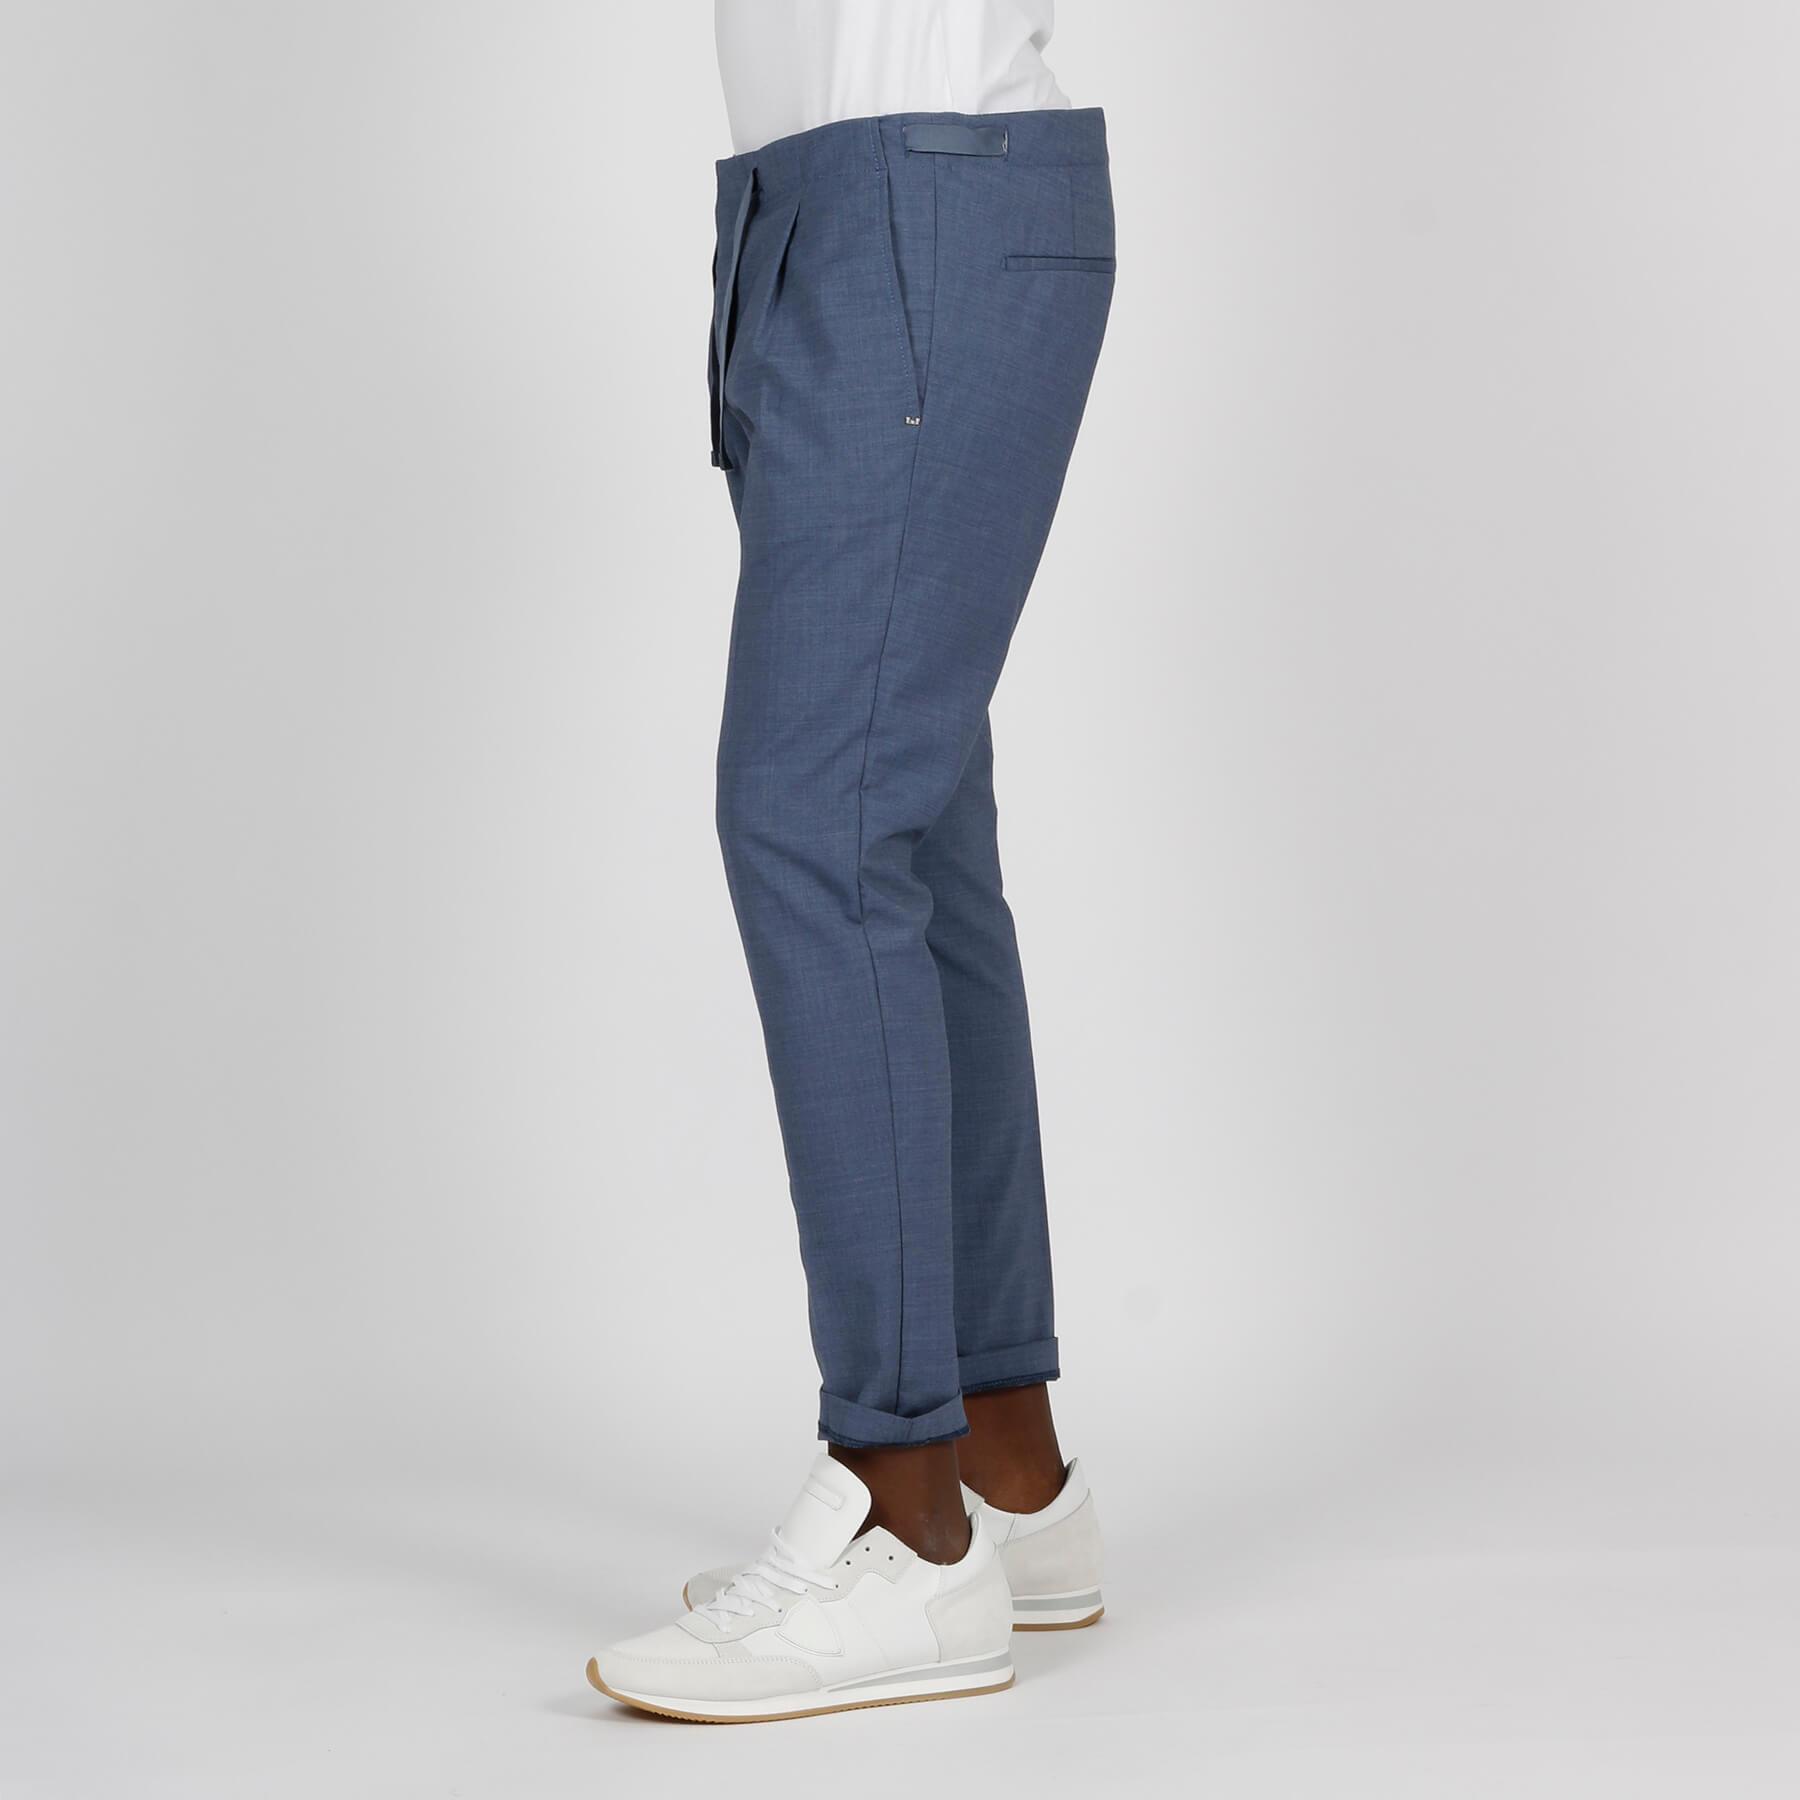 Pantalone orazio - Blu jeans